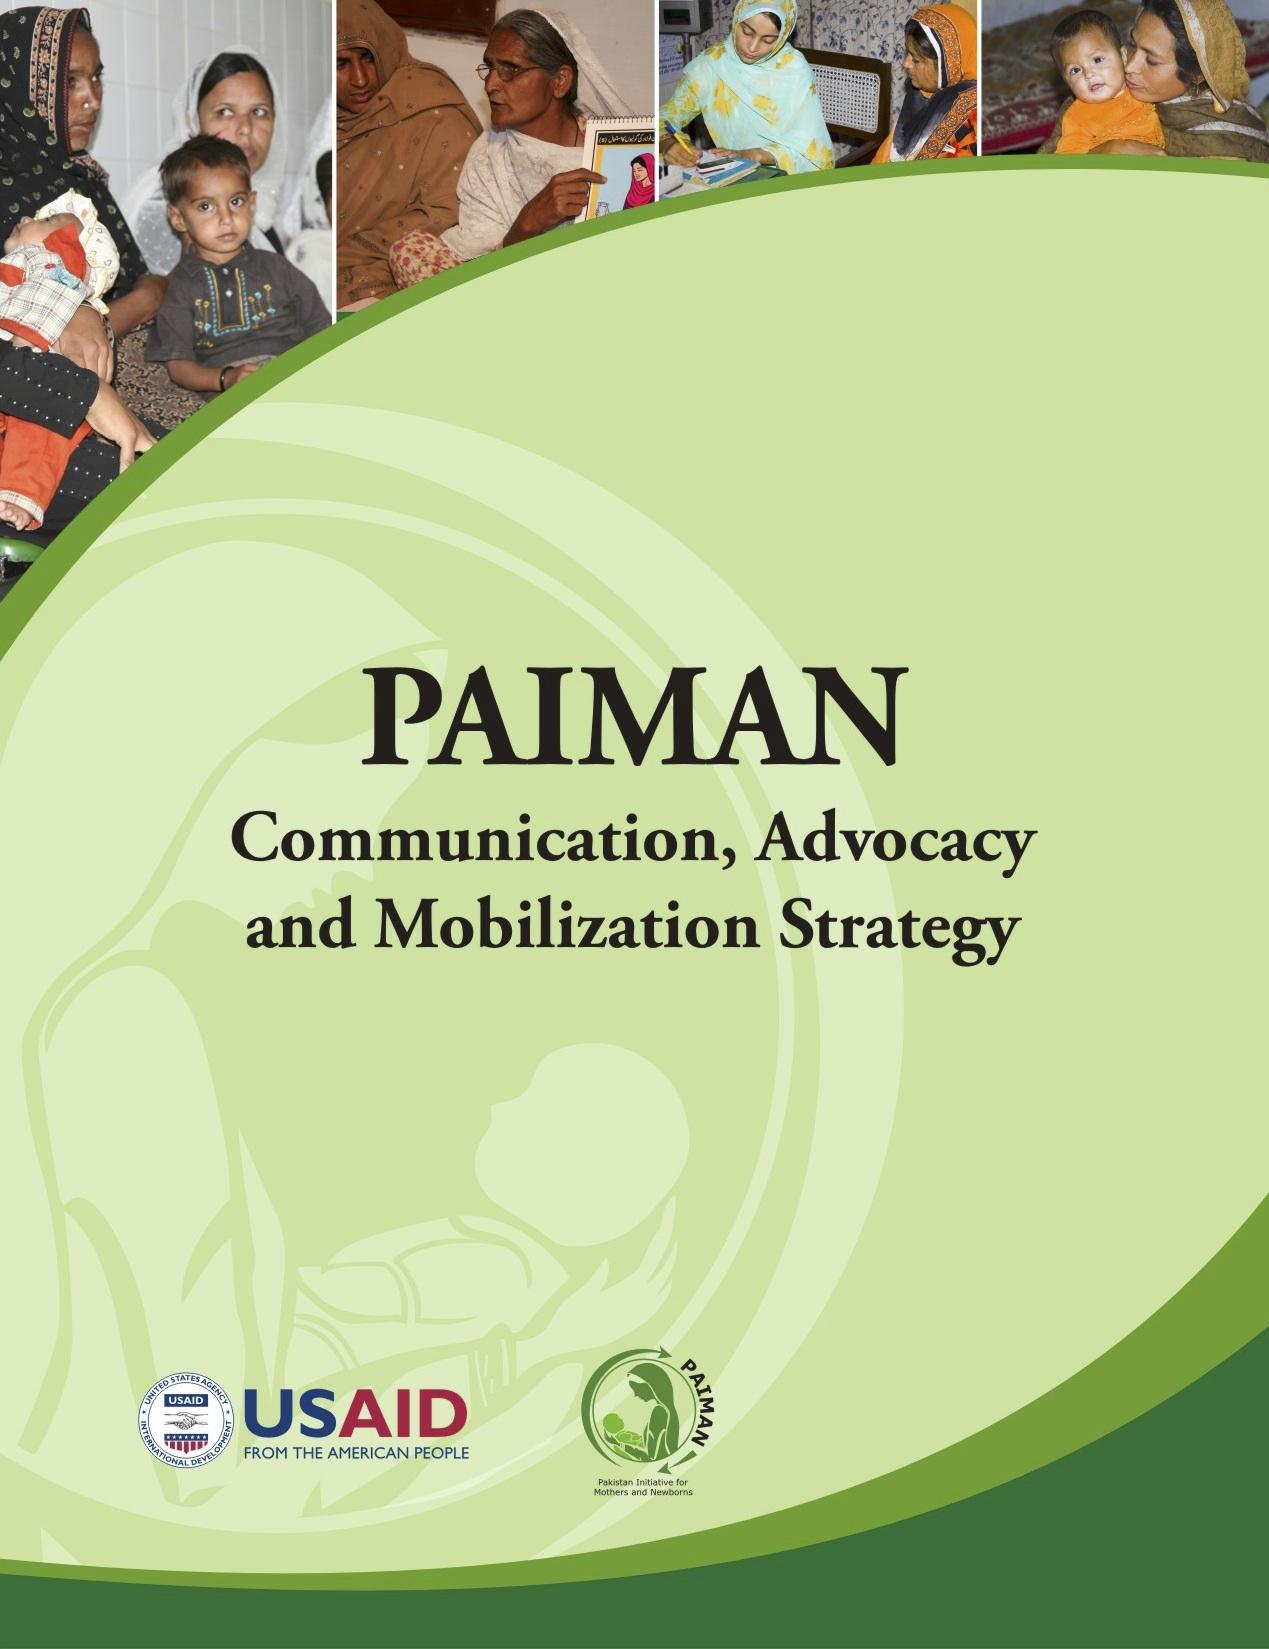 PAIMAN Communication, Advocacy and Mobilization Strategy